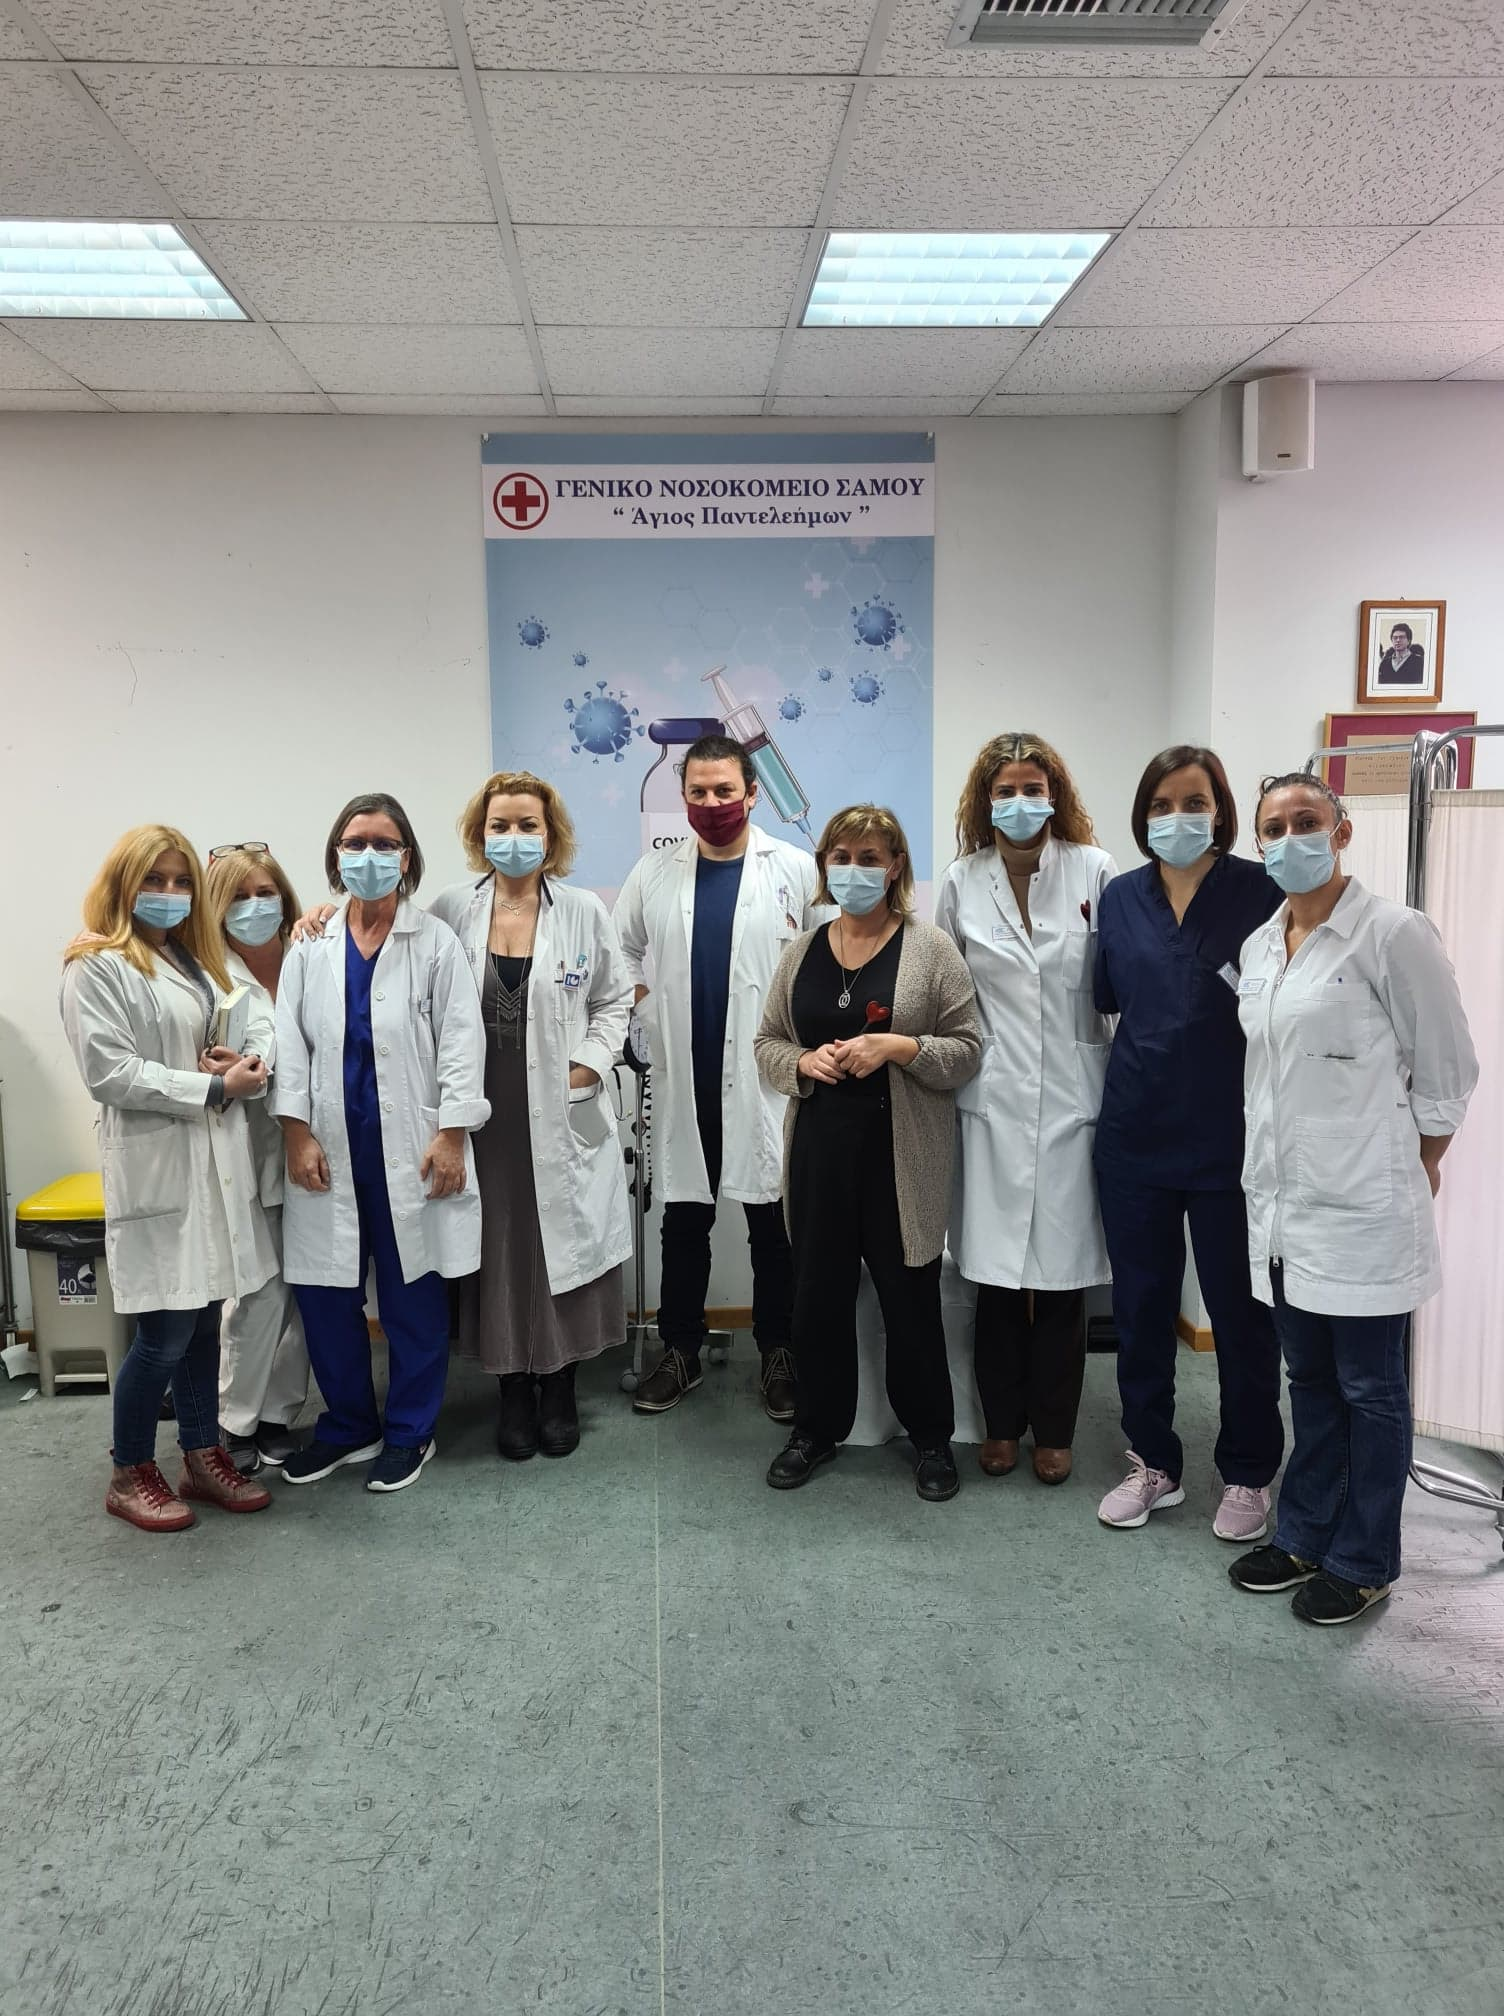 Covid-19. Ολοκληρώνεται η 1η φάση εμβολιασμών στο Νοσοκομείο Σάμου